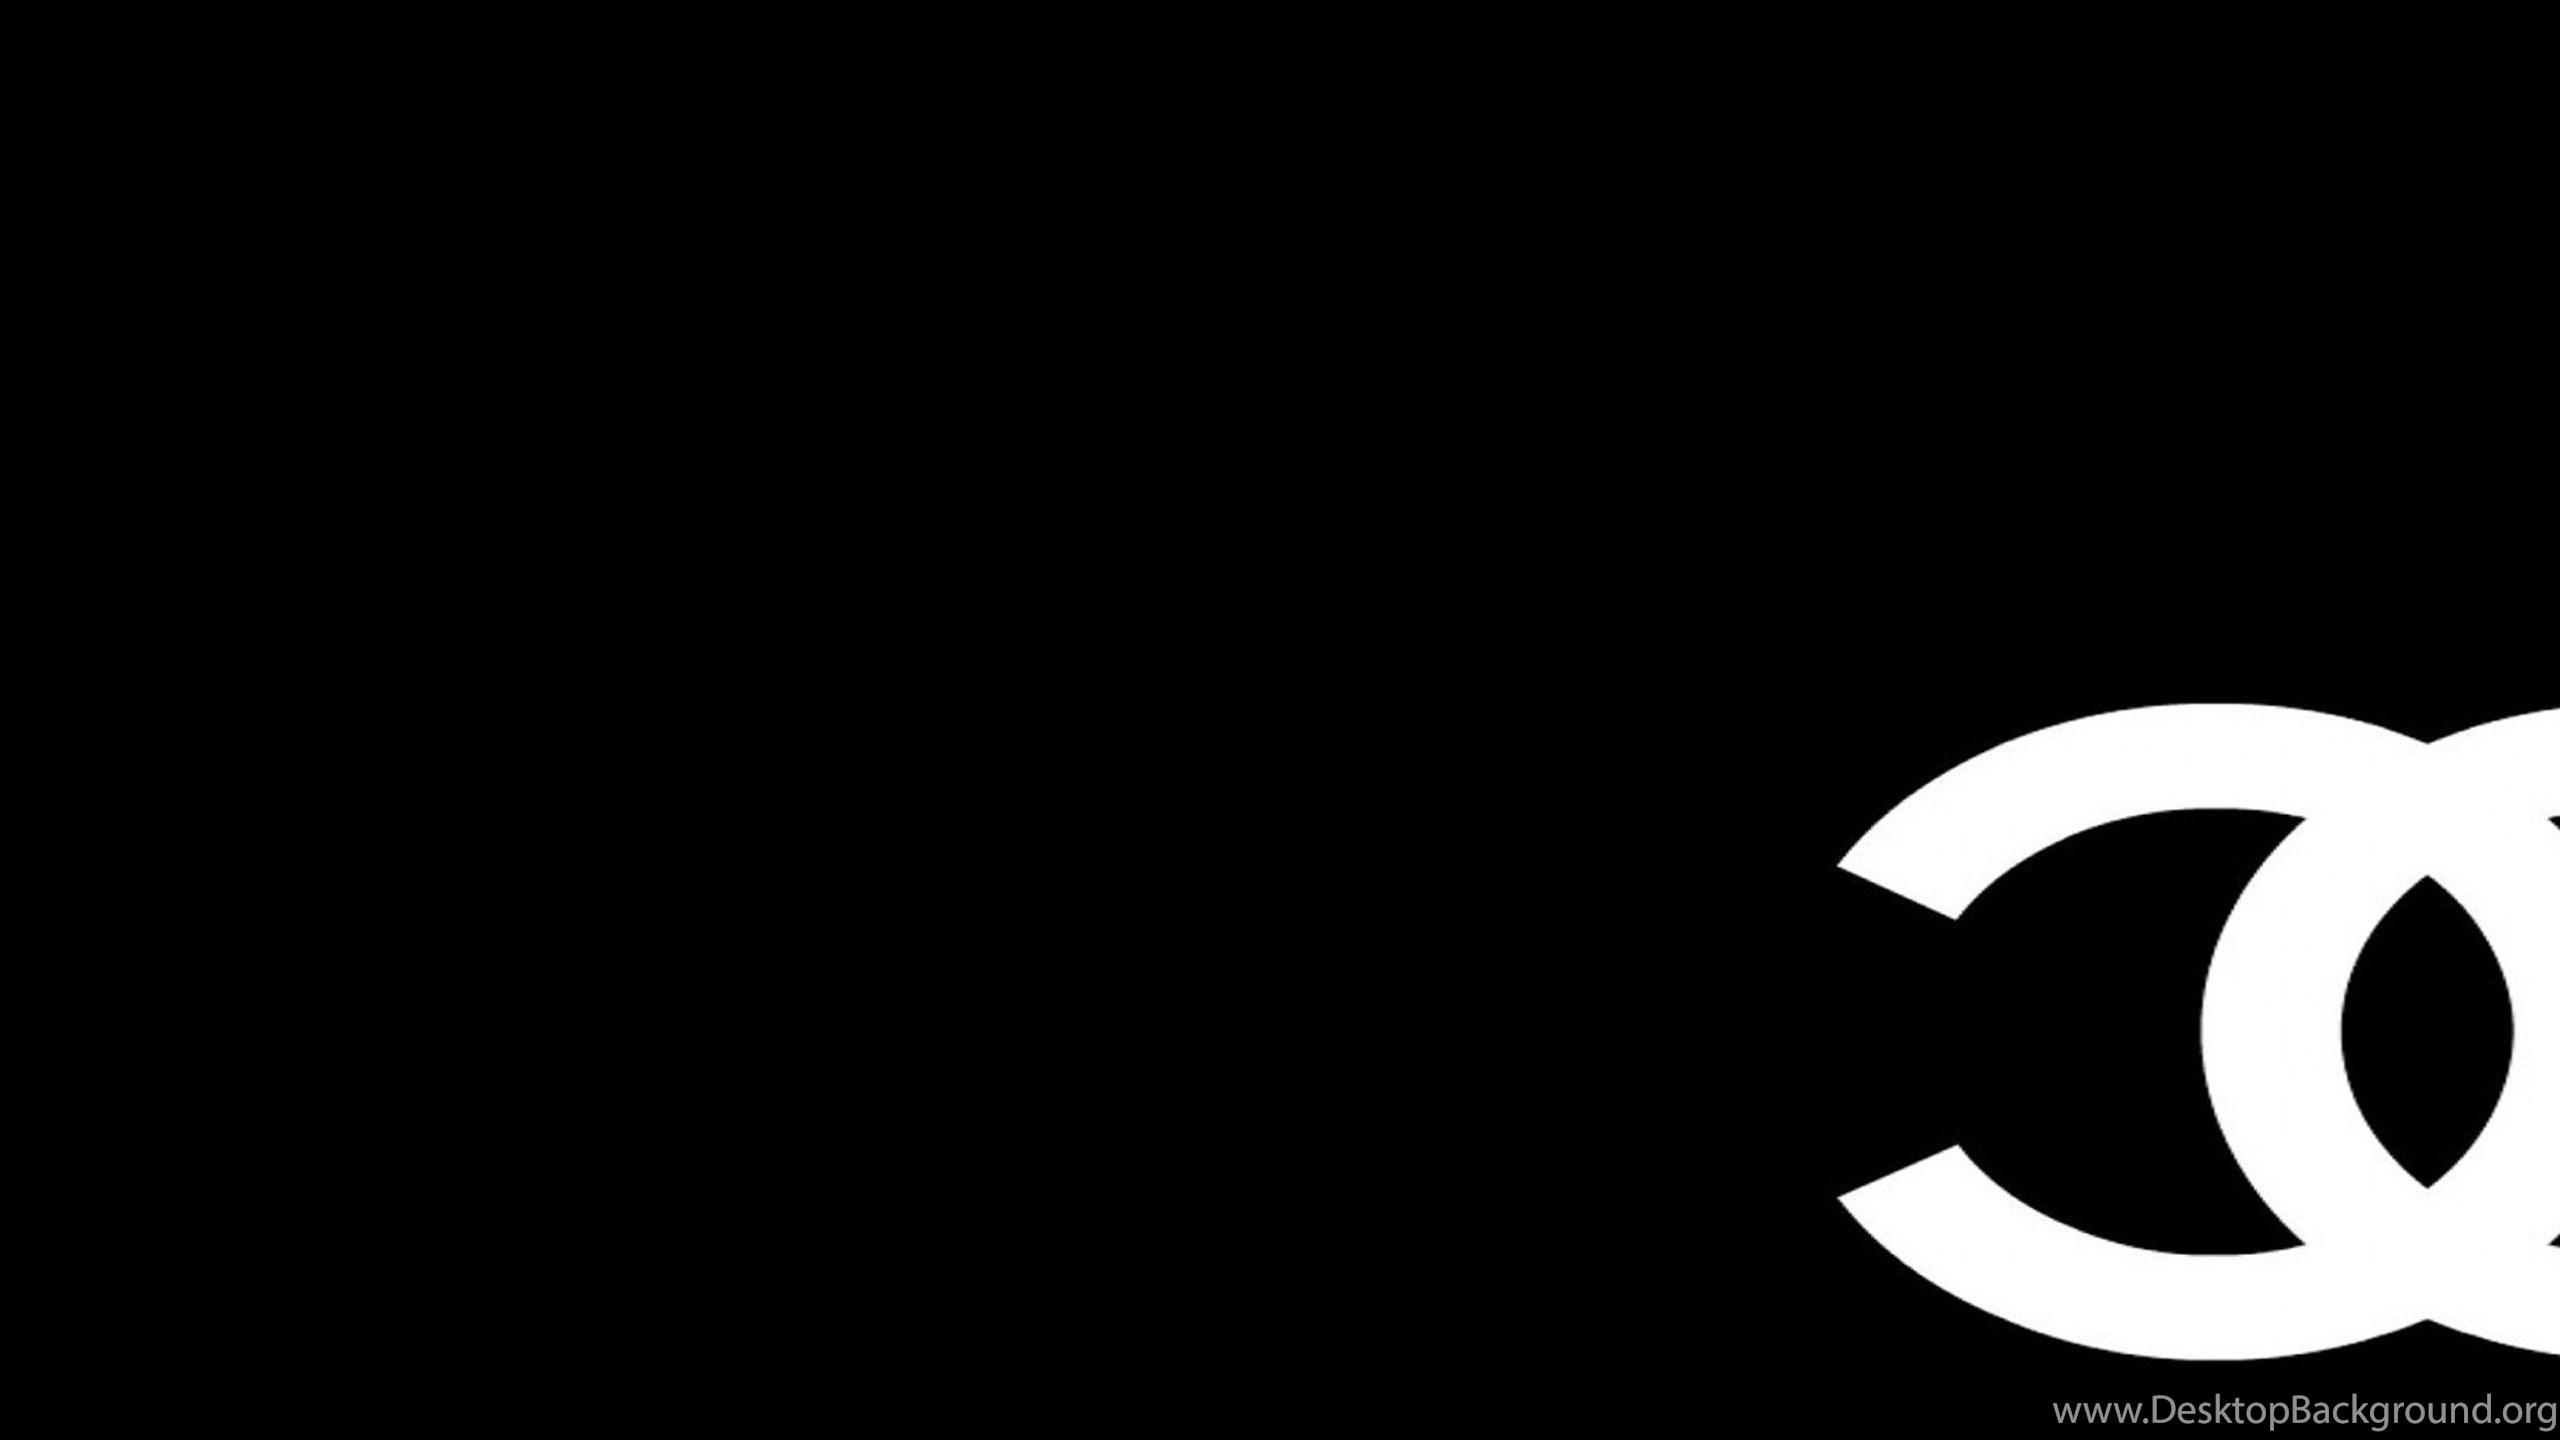 Logo Chanel Wallpapers HD Desktop Background